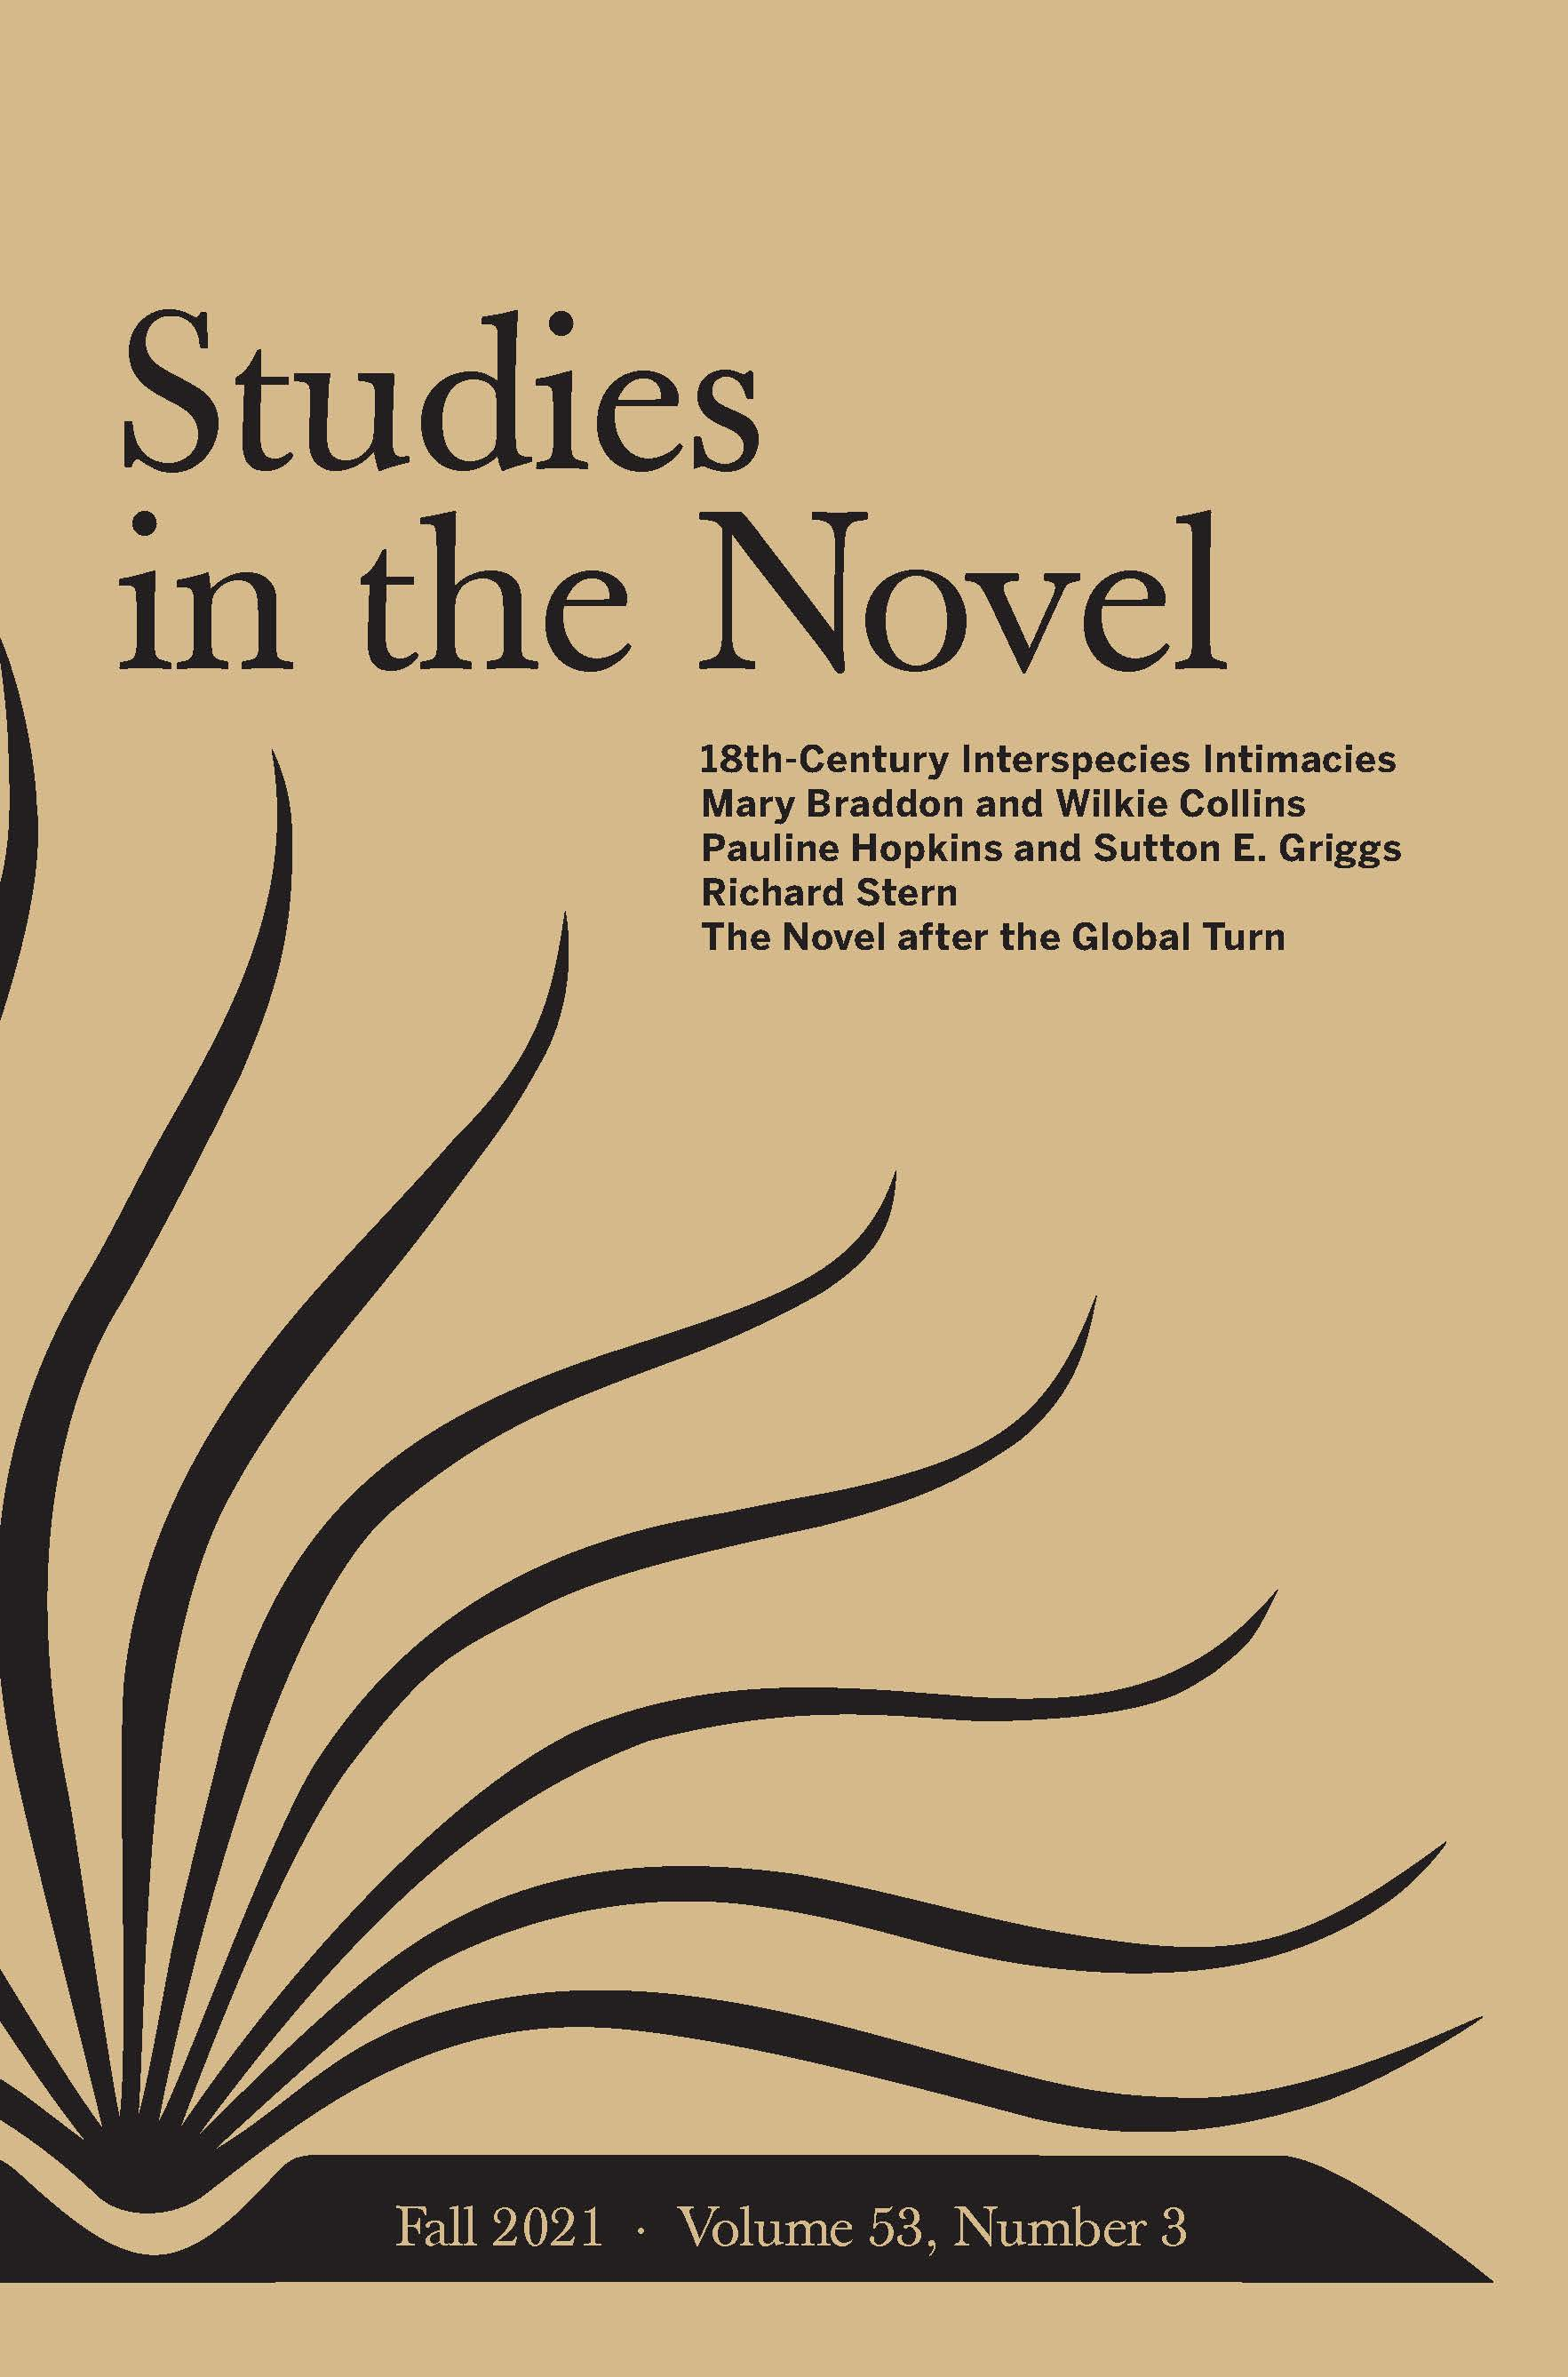 Studies in the Novel: Volume 53, Number 3, Fall 2021